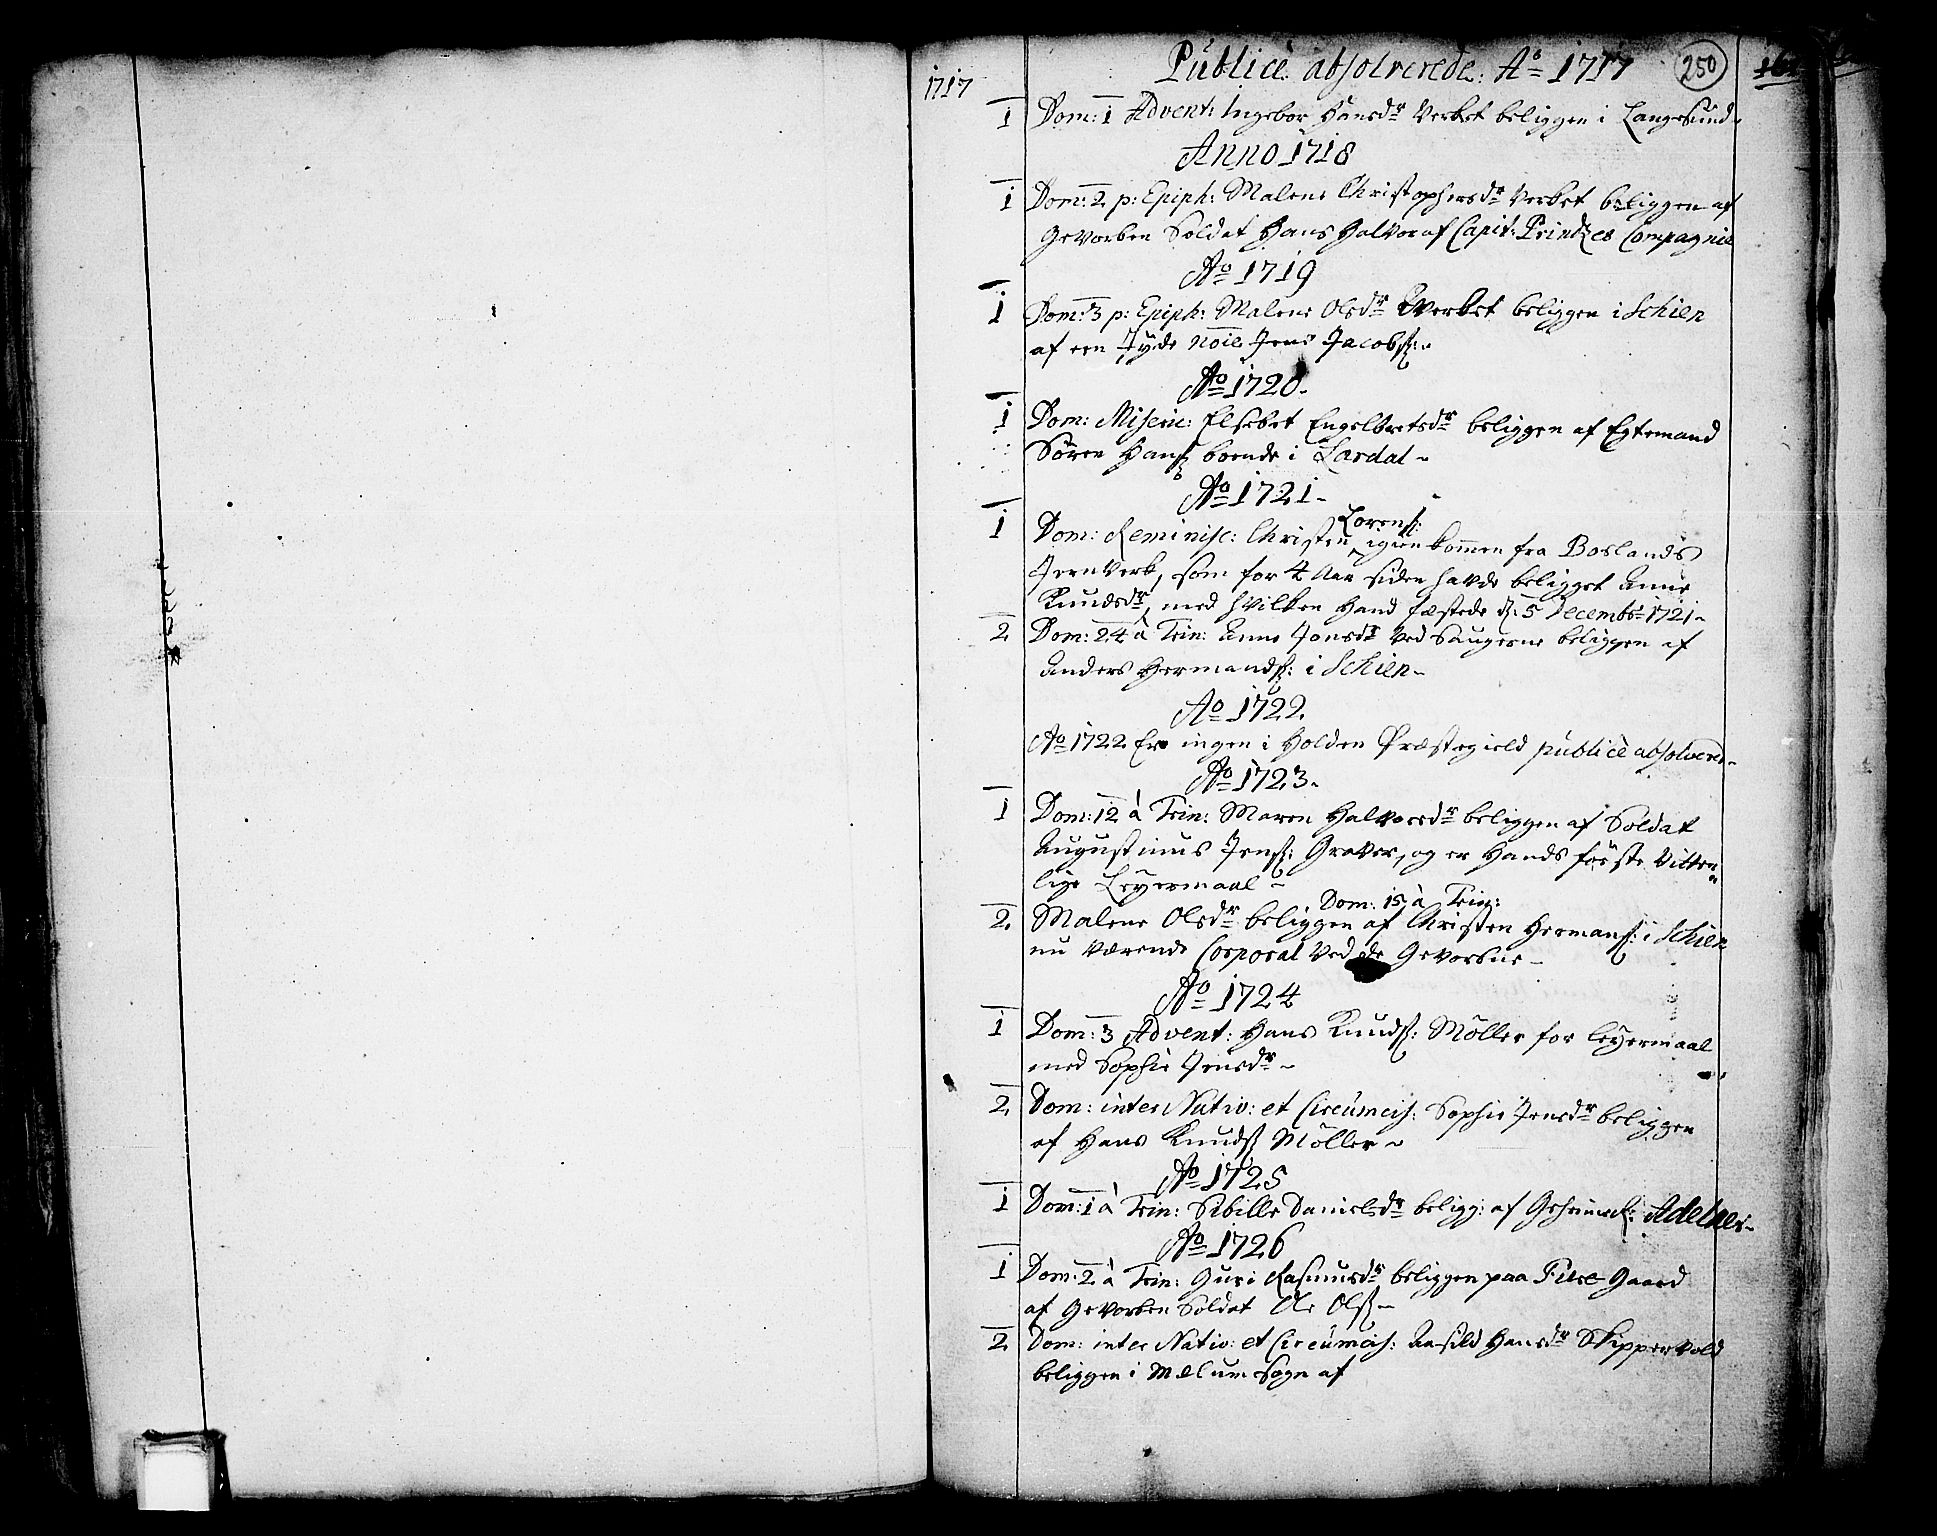 SAKO, Holla kirkebøker, F/Fa/L0001: Ministerialbok nr. 1, 1717-1779, s. 250